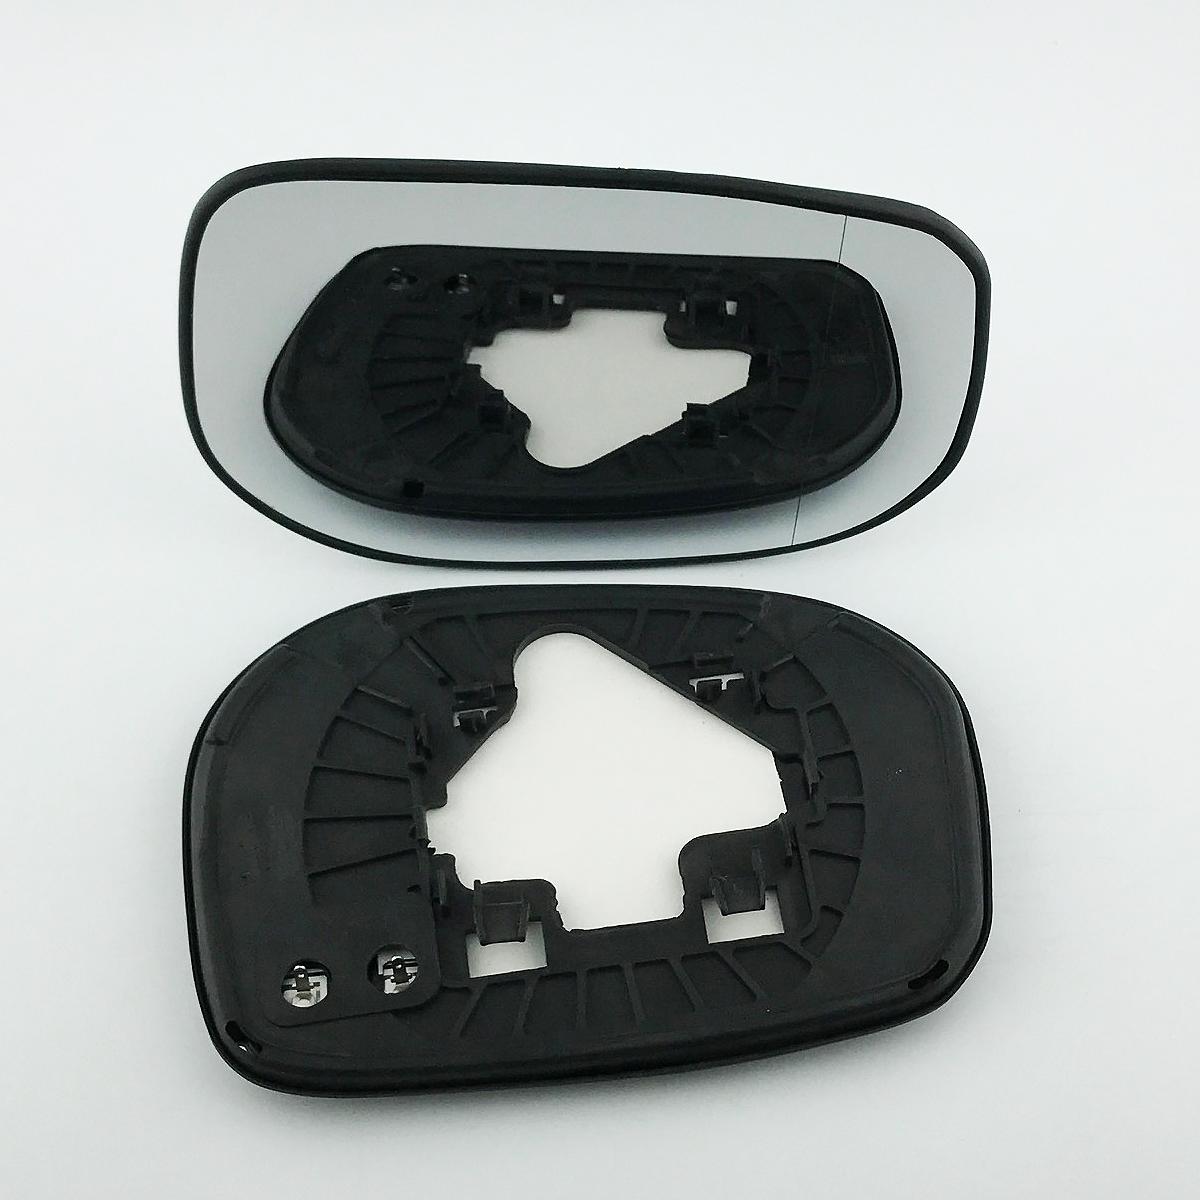 Passenger Side ,2008 onward Twingo Wing Mirror s-Silver,LH